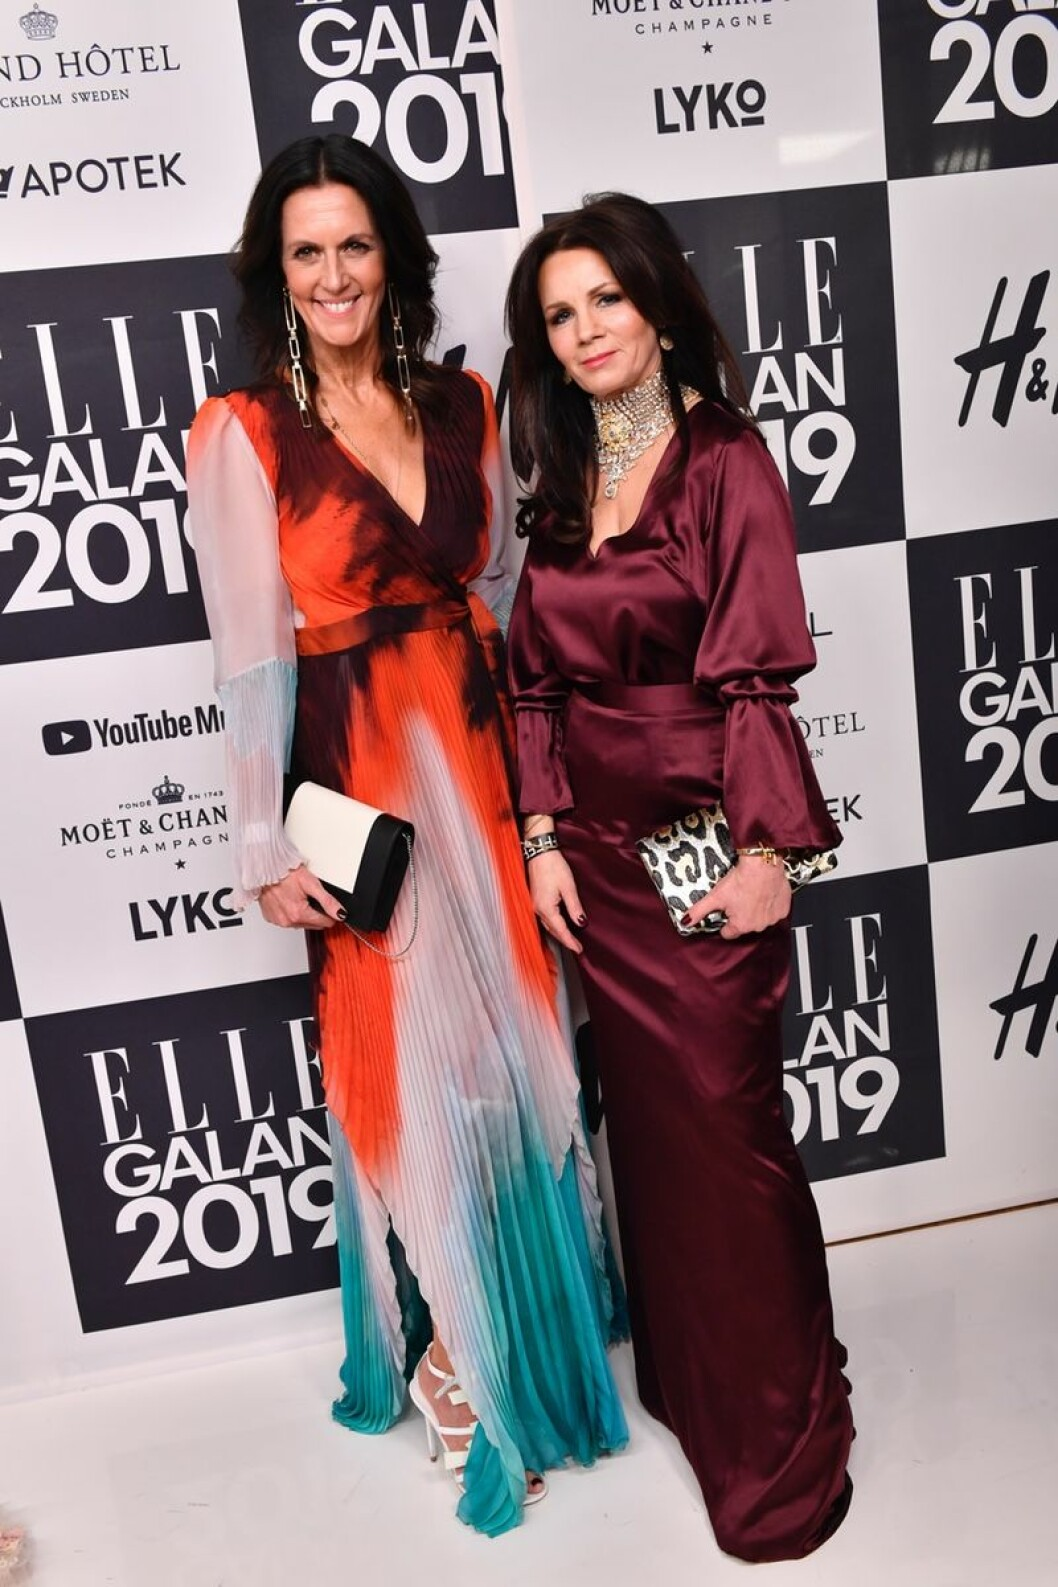 Lena Philipsson ELLEgalan 2019